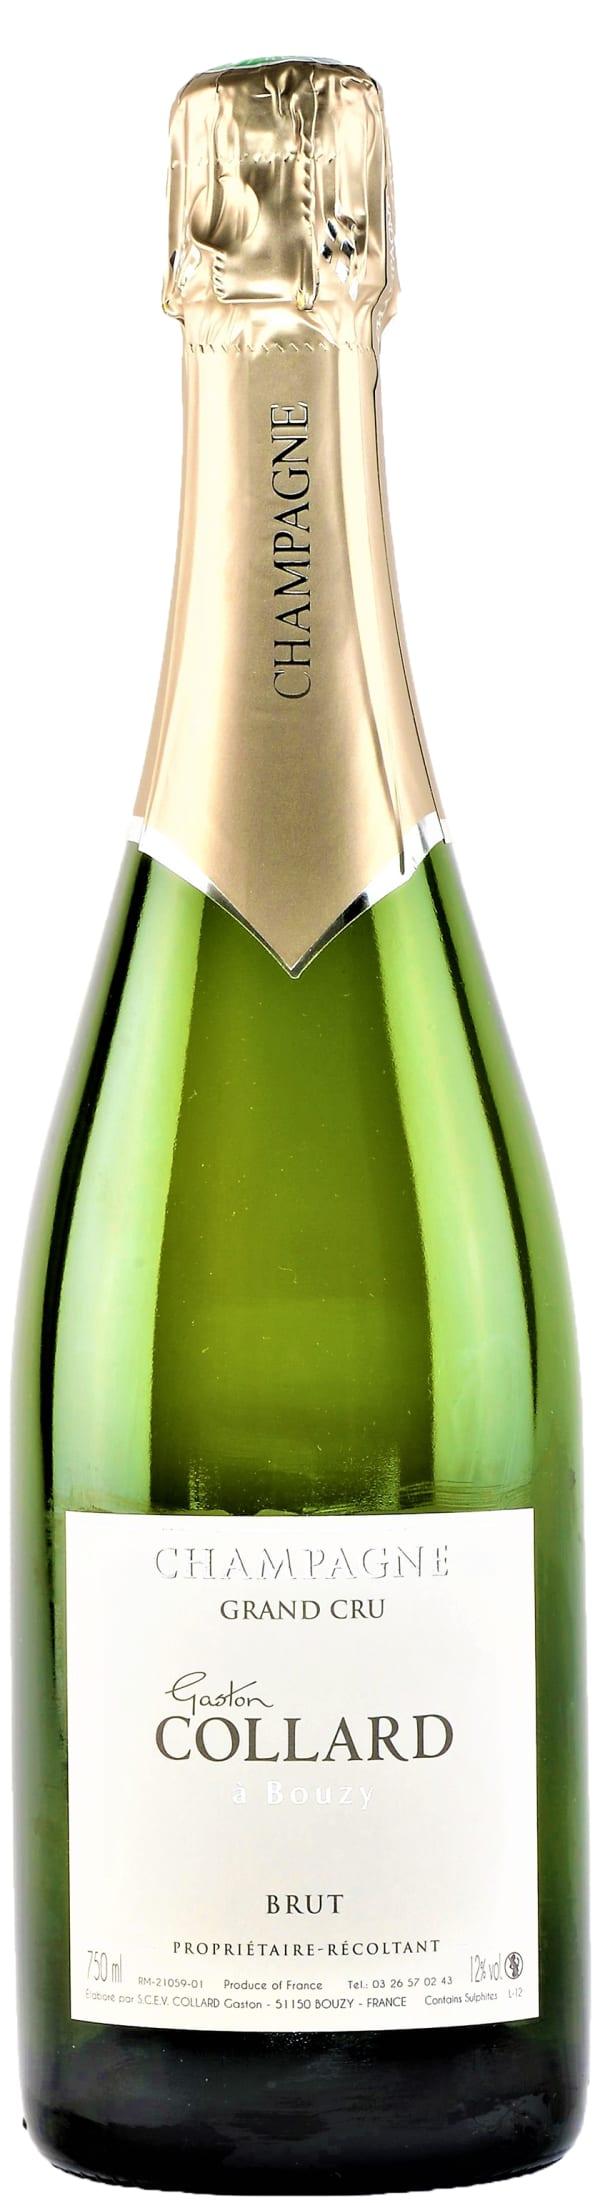 Gaston Collard Bouzy Grand Cru Champagne Brut